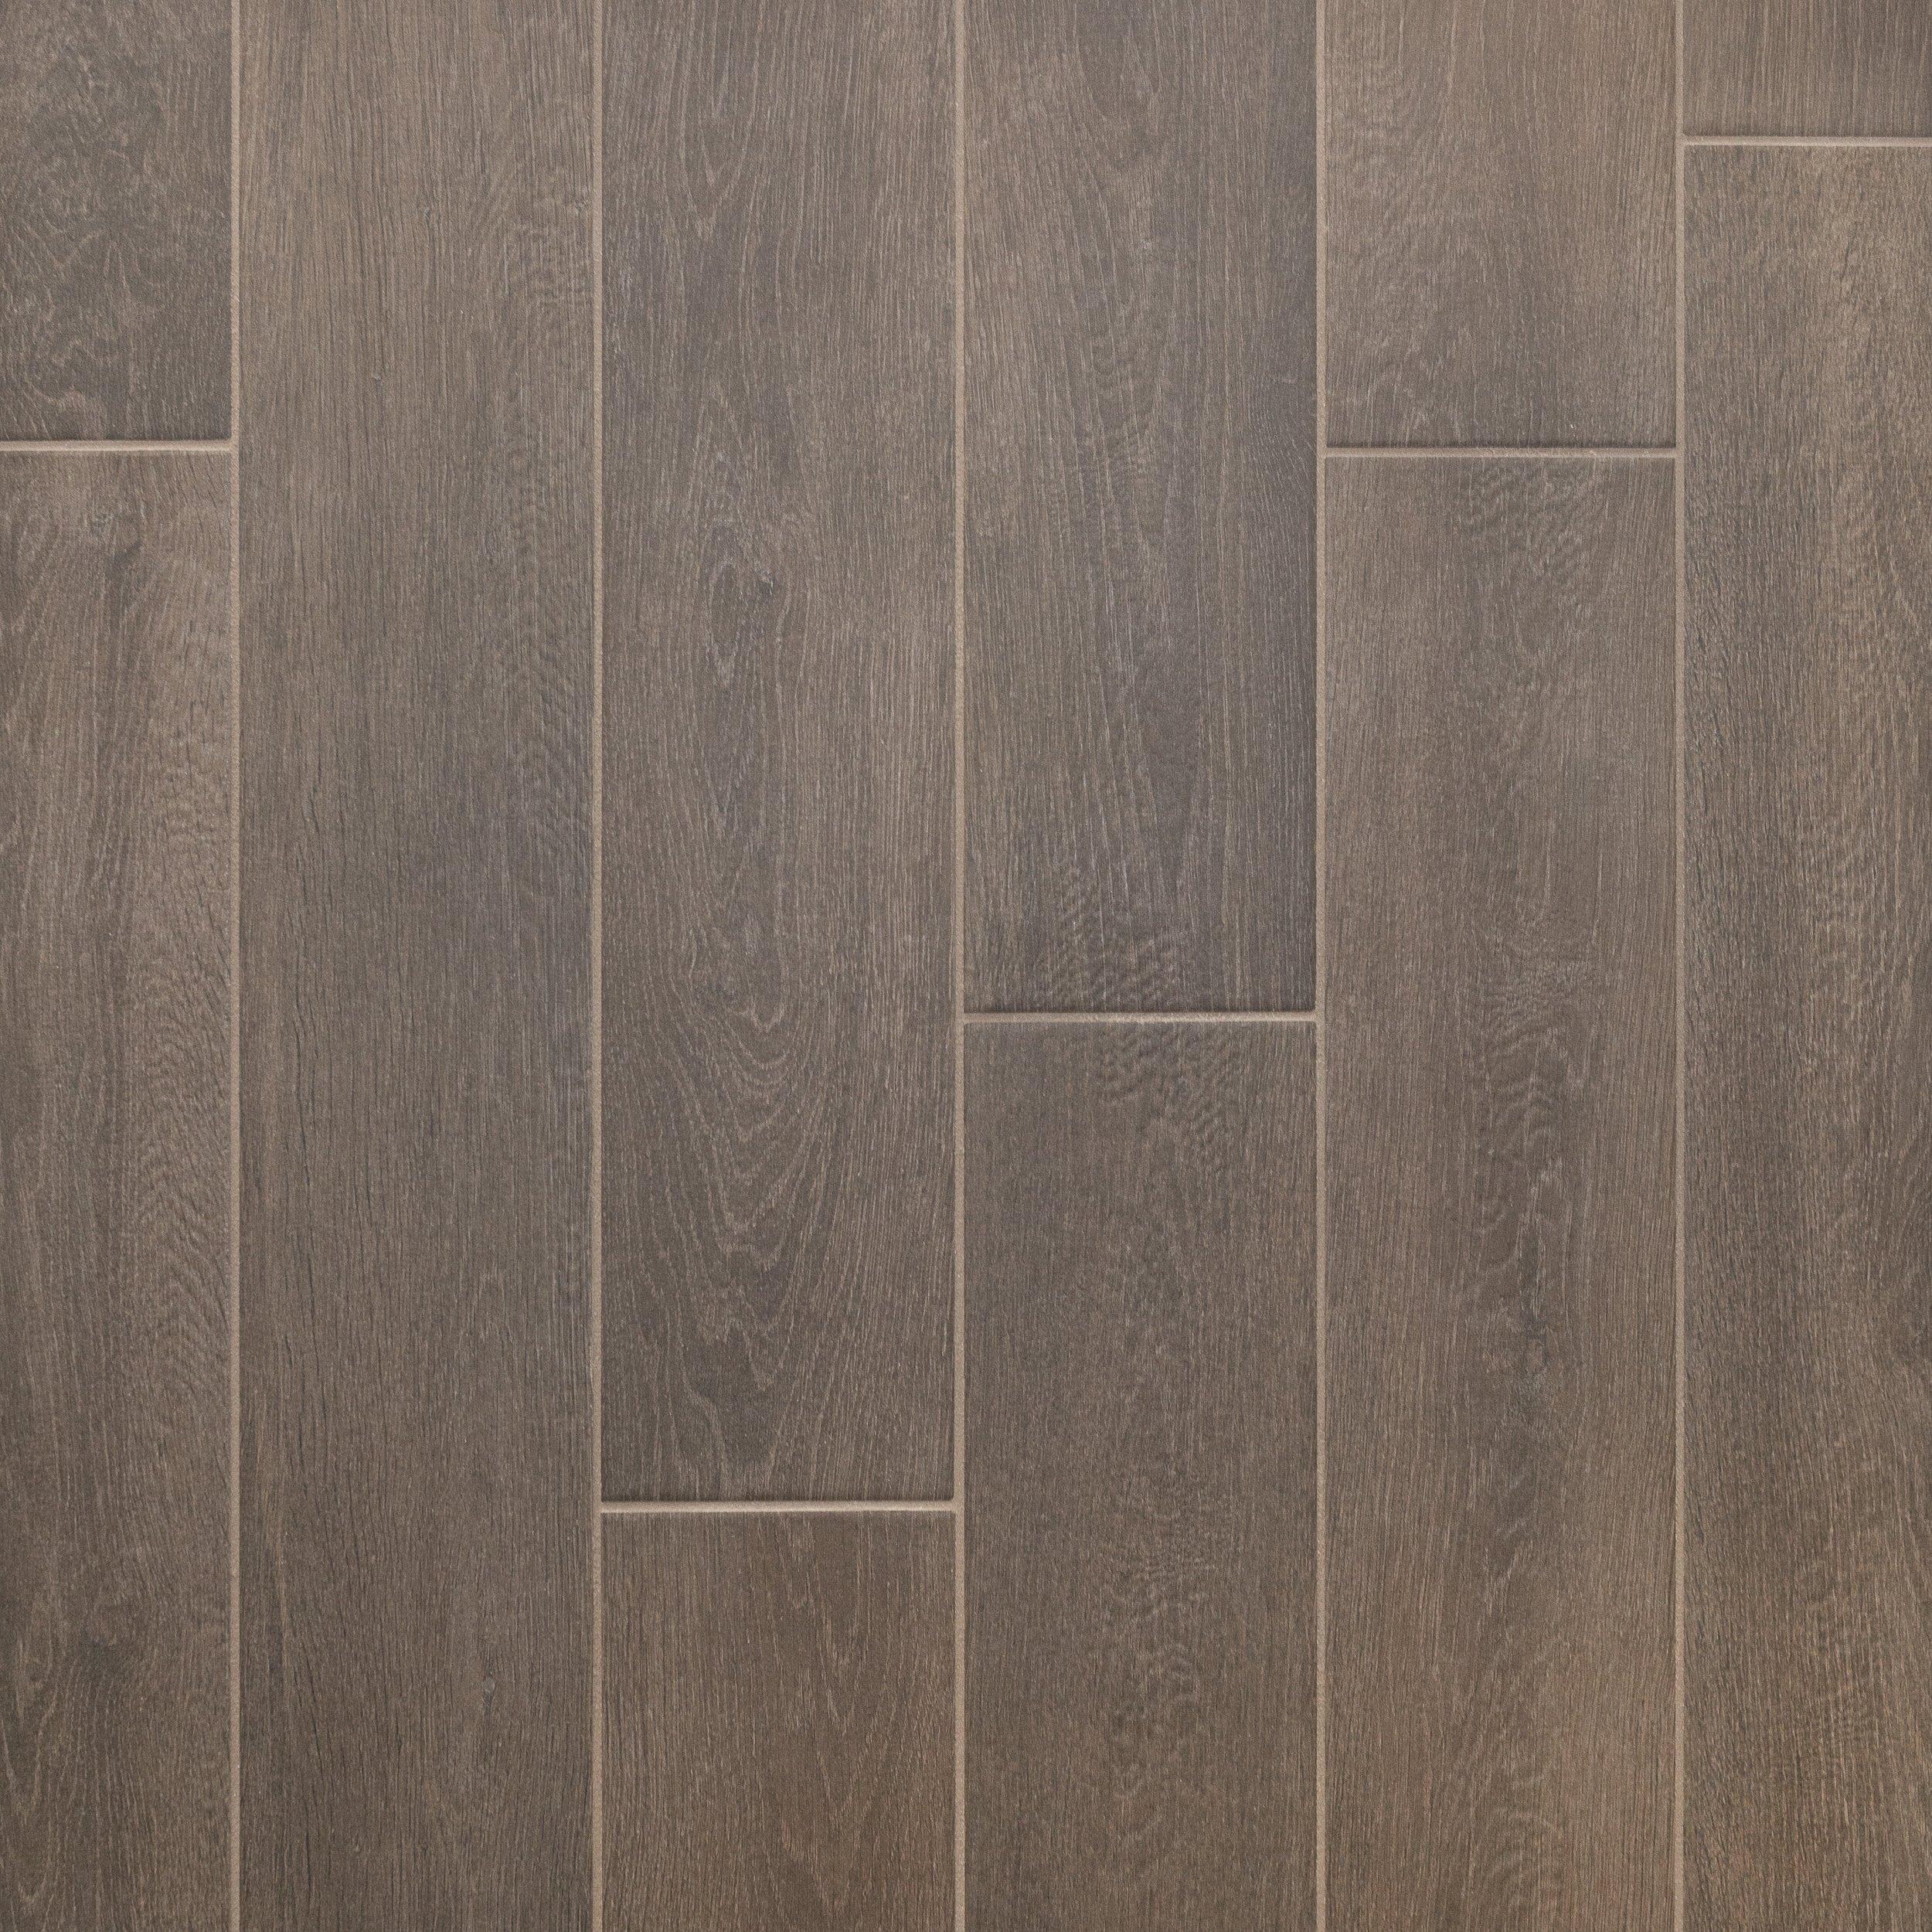 Ridgewood Espresso Wood Plank Porcelain Tile In 2020 Wood Look Tile Porcelain Wood Tile Kitchen Porcelain Tile